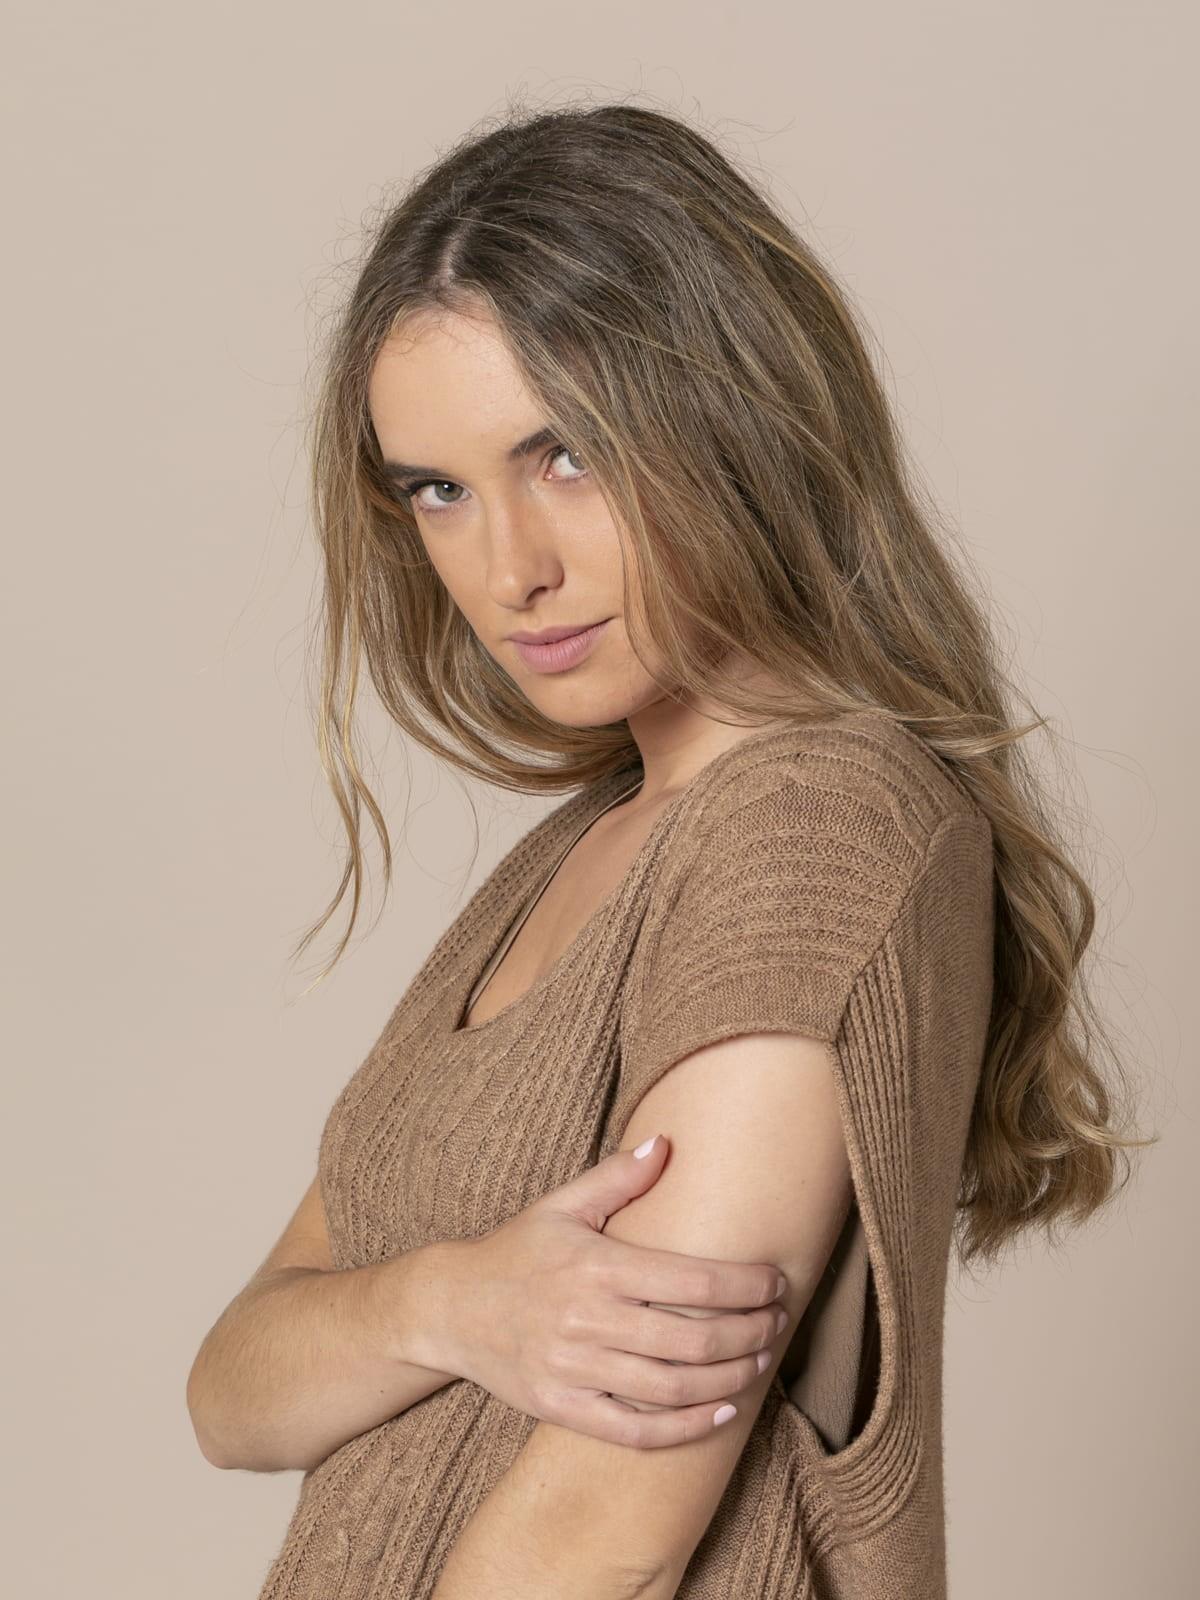 Woman Short braided knit vest Camel